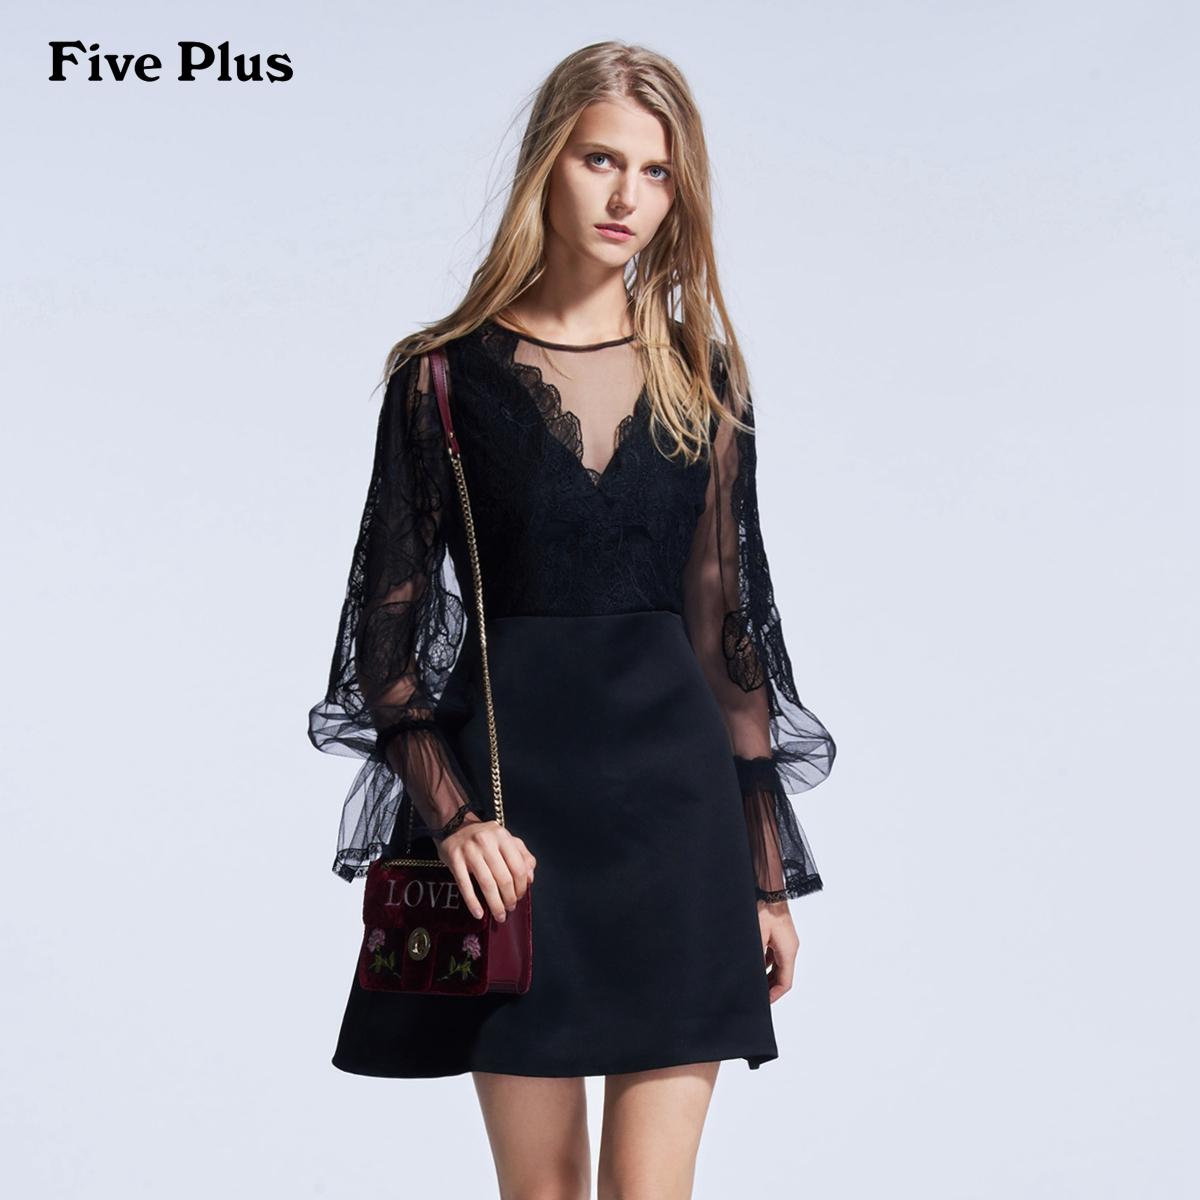 Five Plus2018新款女装拼蕾丝连衣裙女高腰长袖V领小黑裙商场同款